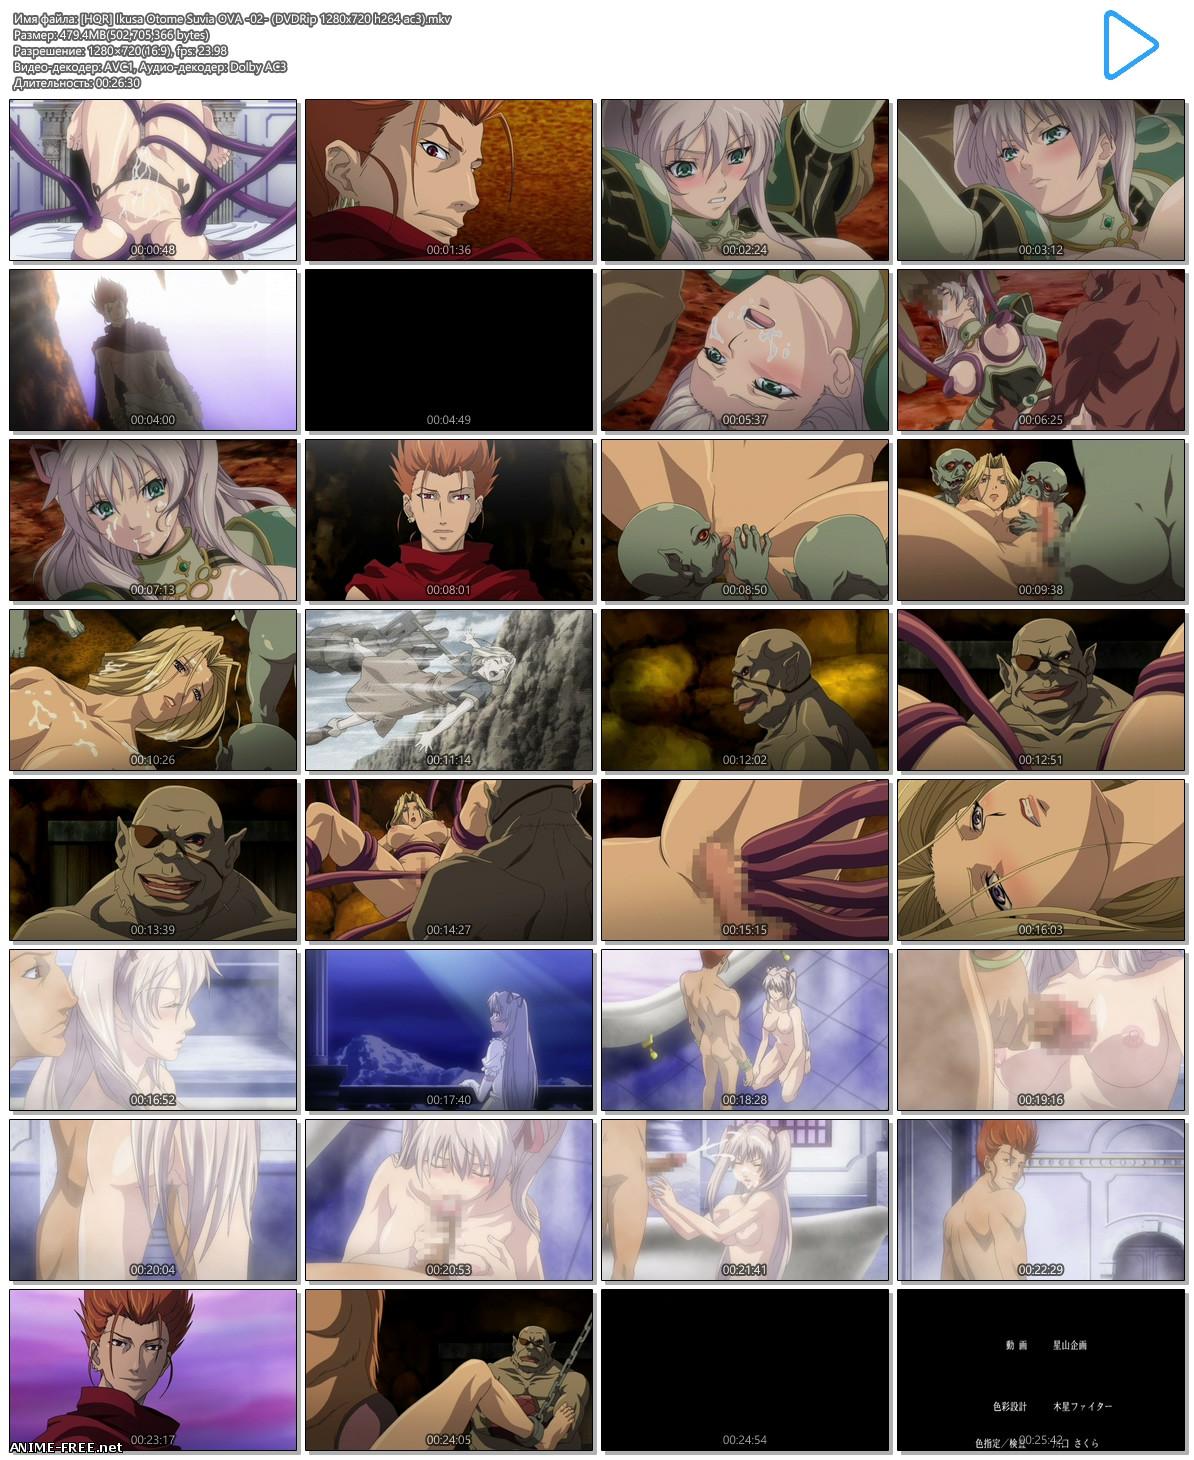 Ikusa Otome Suvia / Боевая дева Сувия [Ep.1-4] [RUS,JAP,ENG] [720p] Anime Hentai